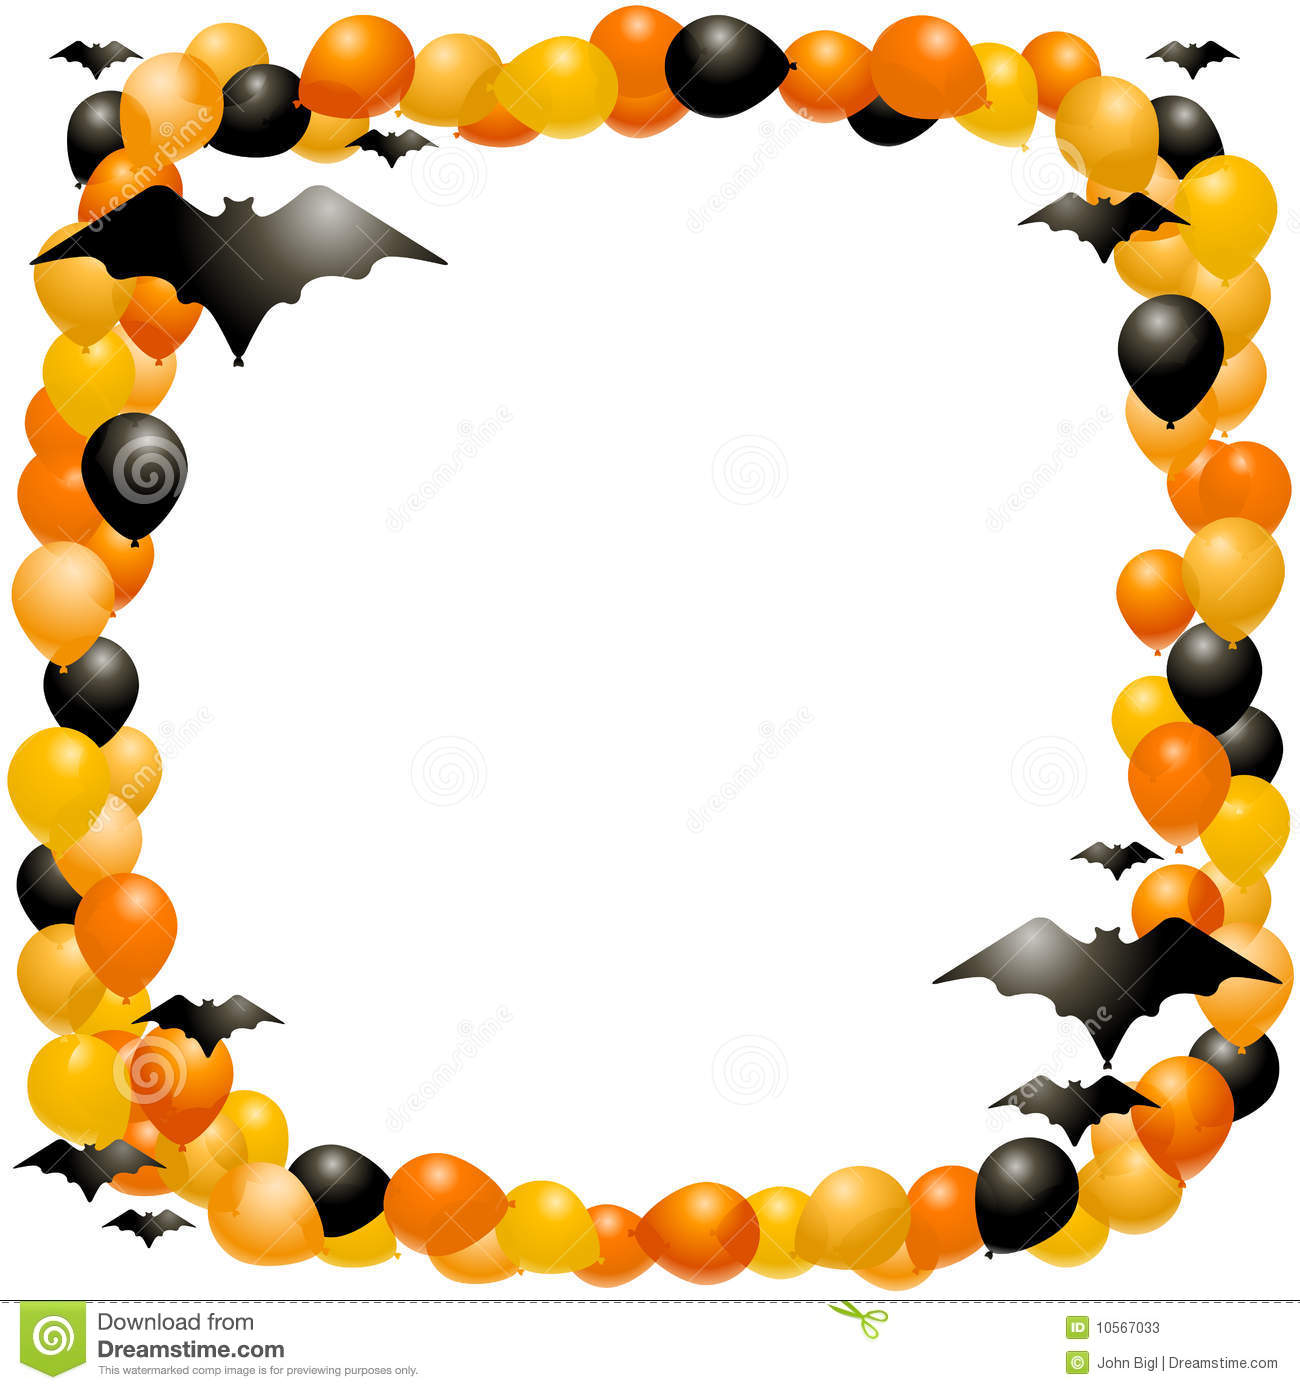 Halloween Clip Art Borders .-Halloween Clip Art Borders .-14